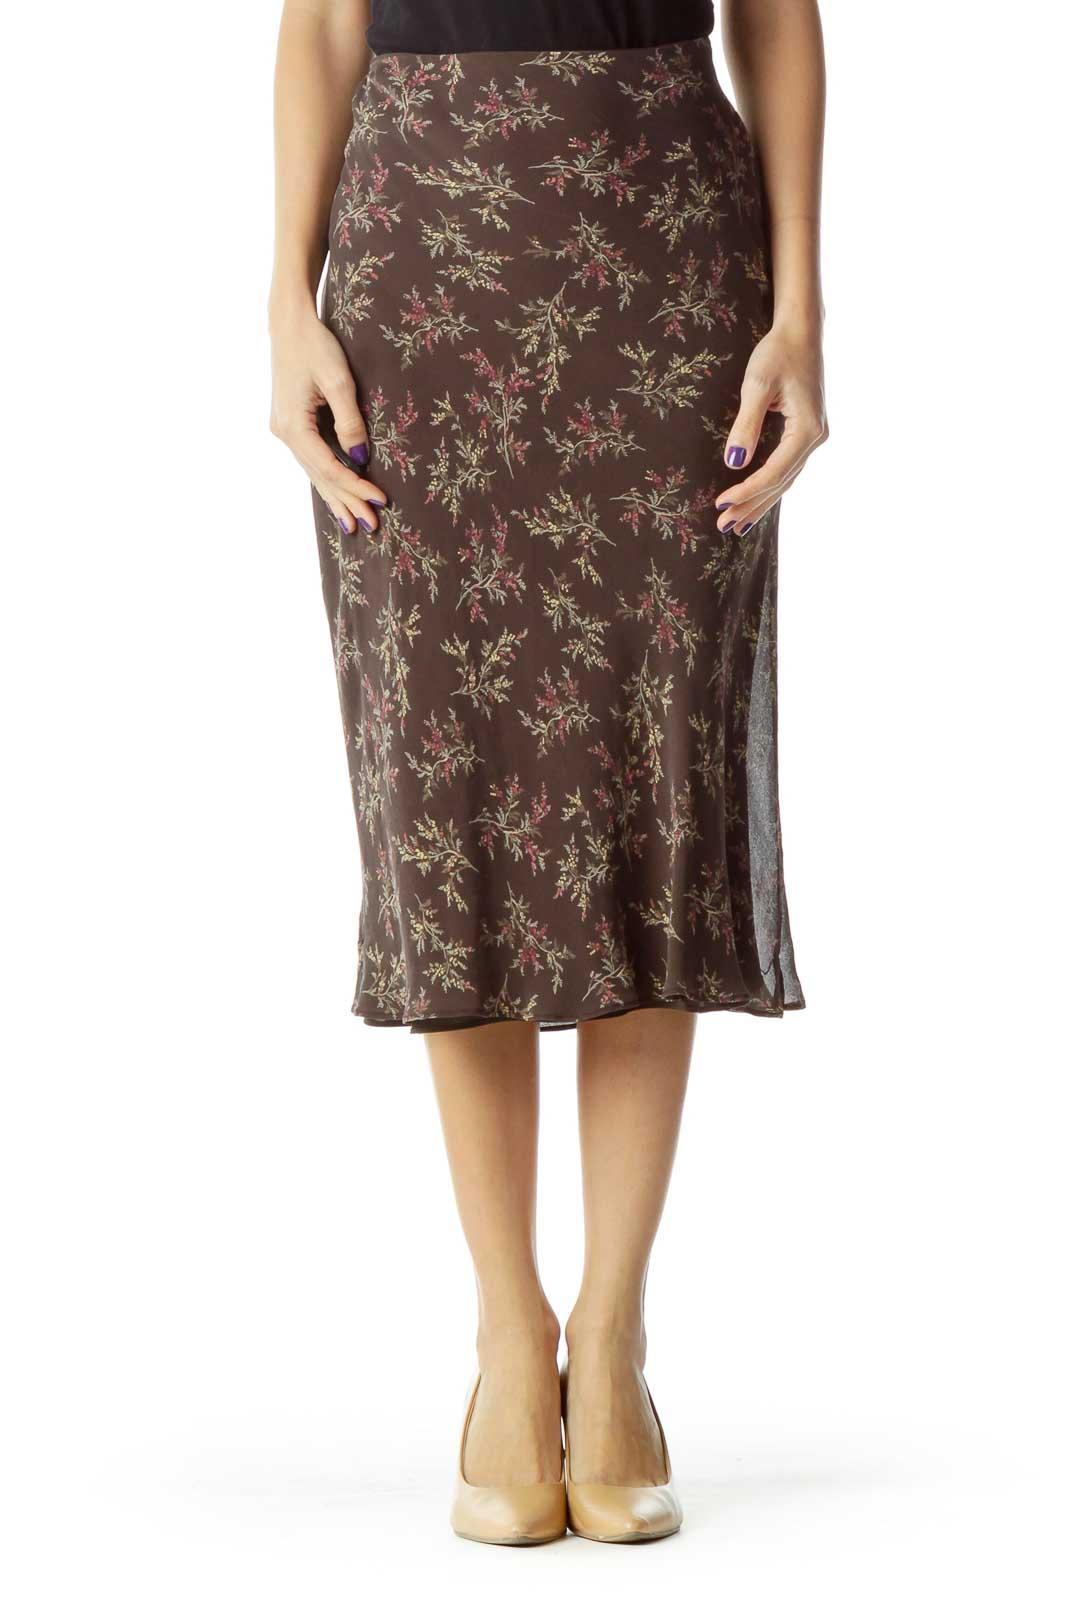 Brown Floral Knee-Length Skirt Front